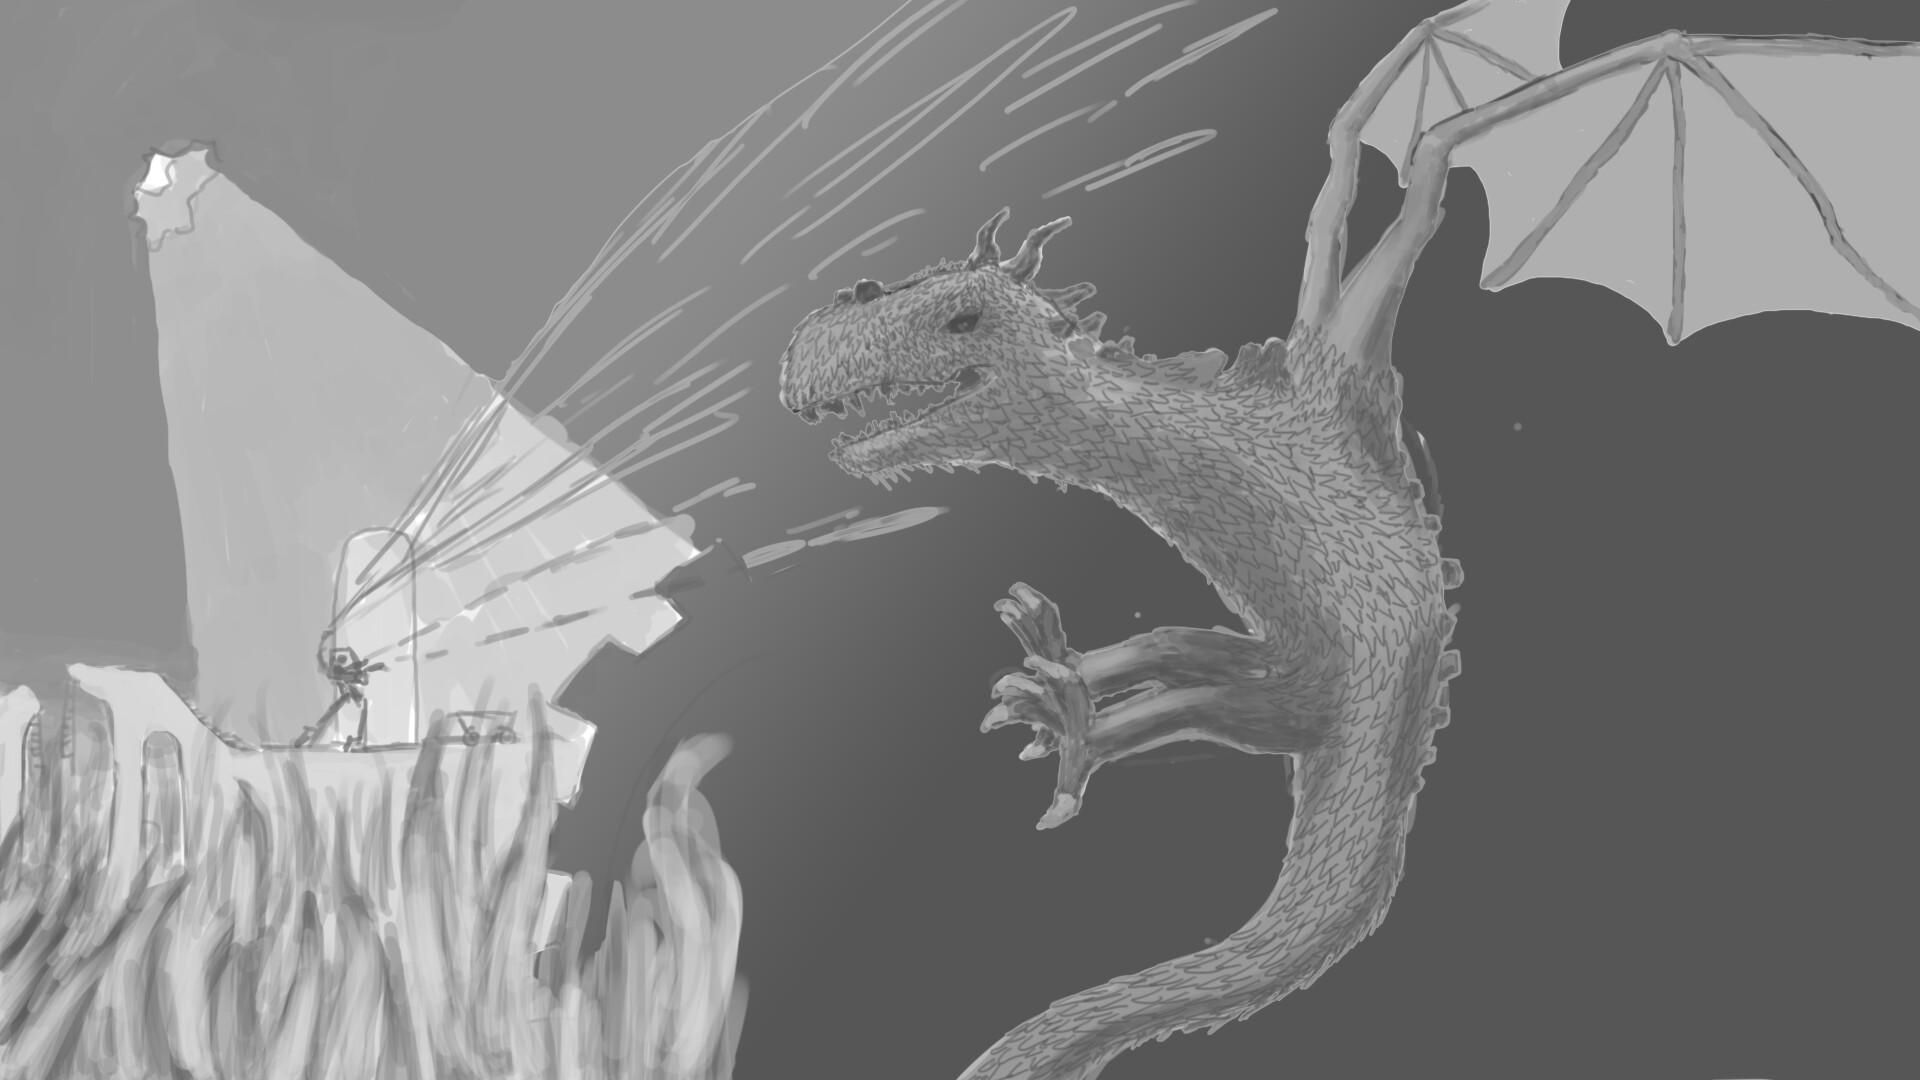 Alexander laheij dragon vs mech